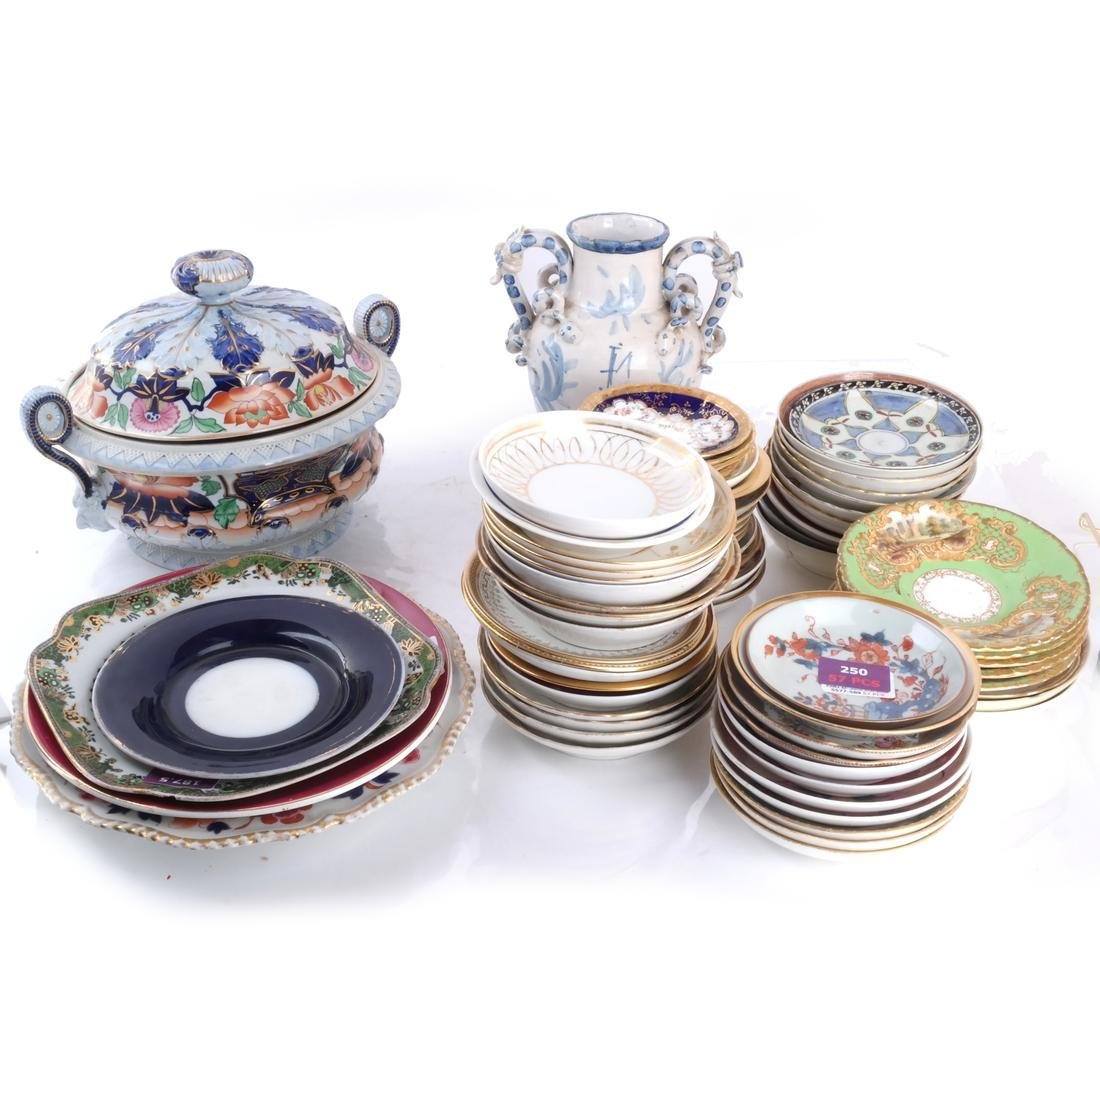 Assorted Porcelain Dessert/Dinnerware